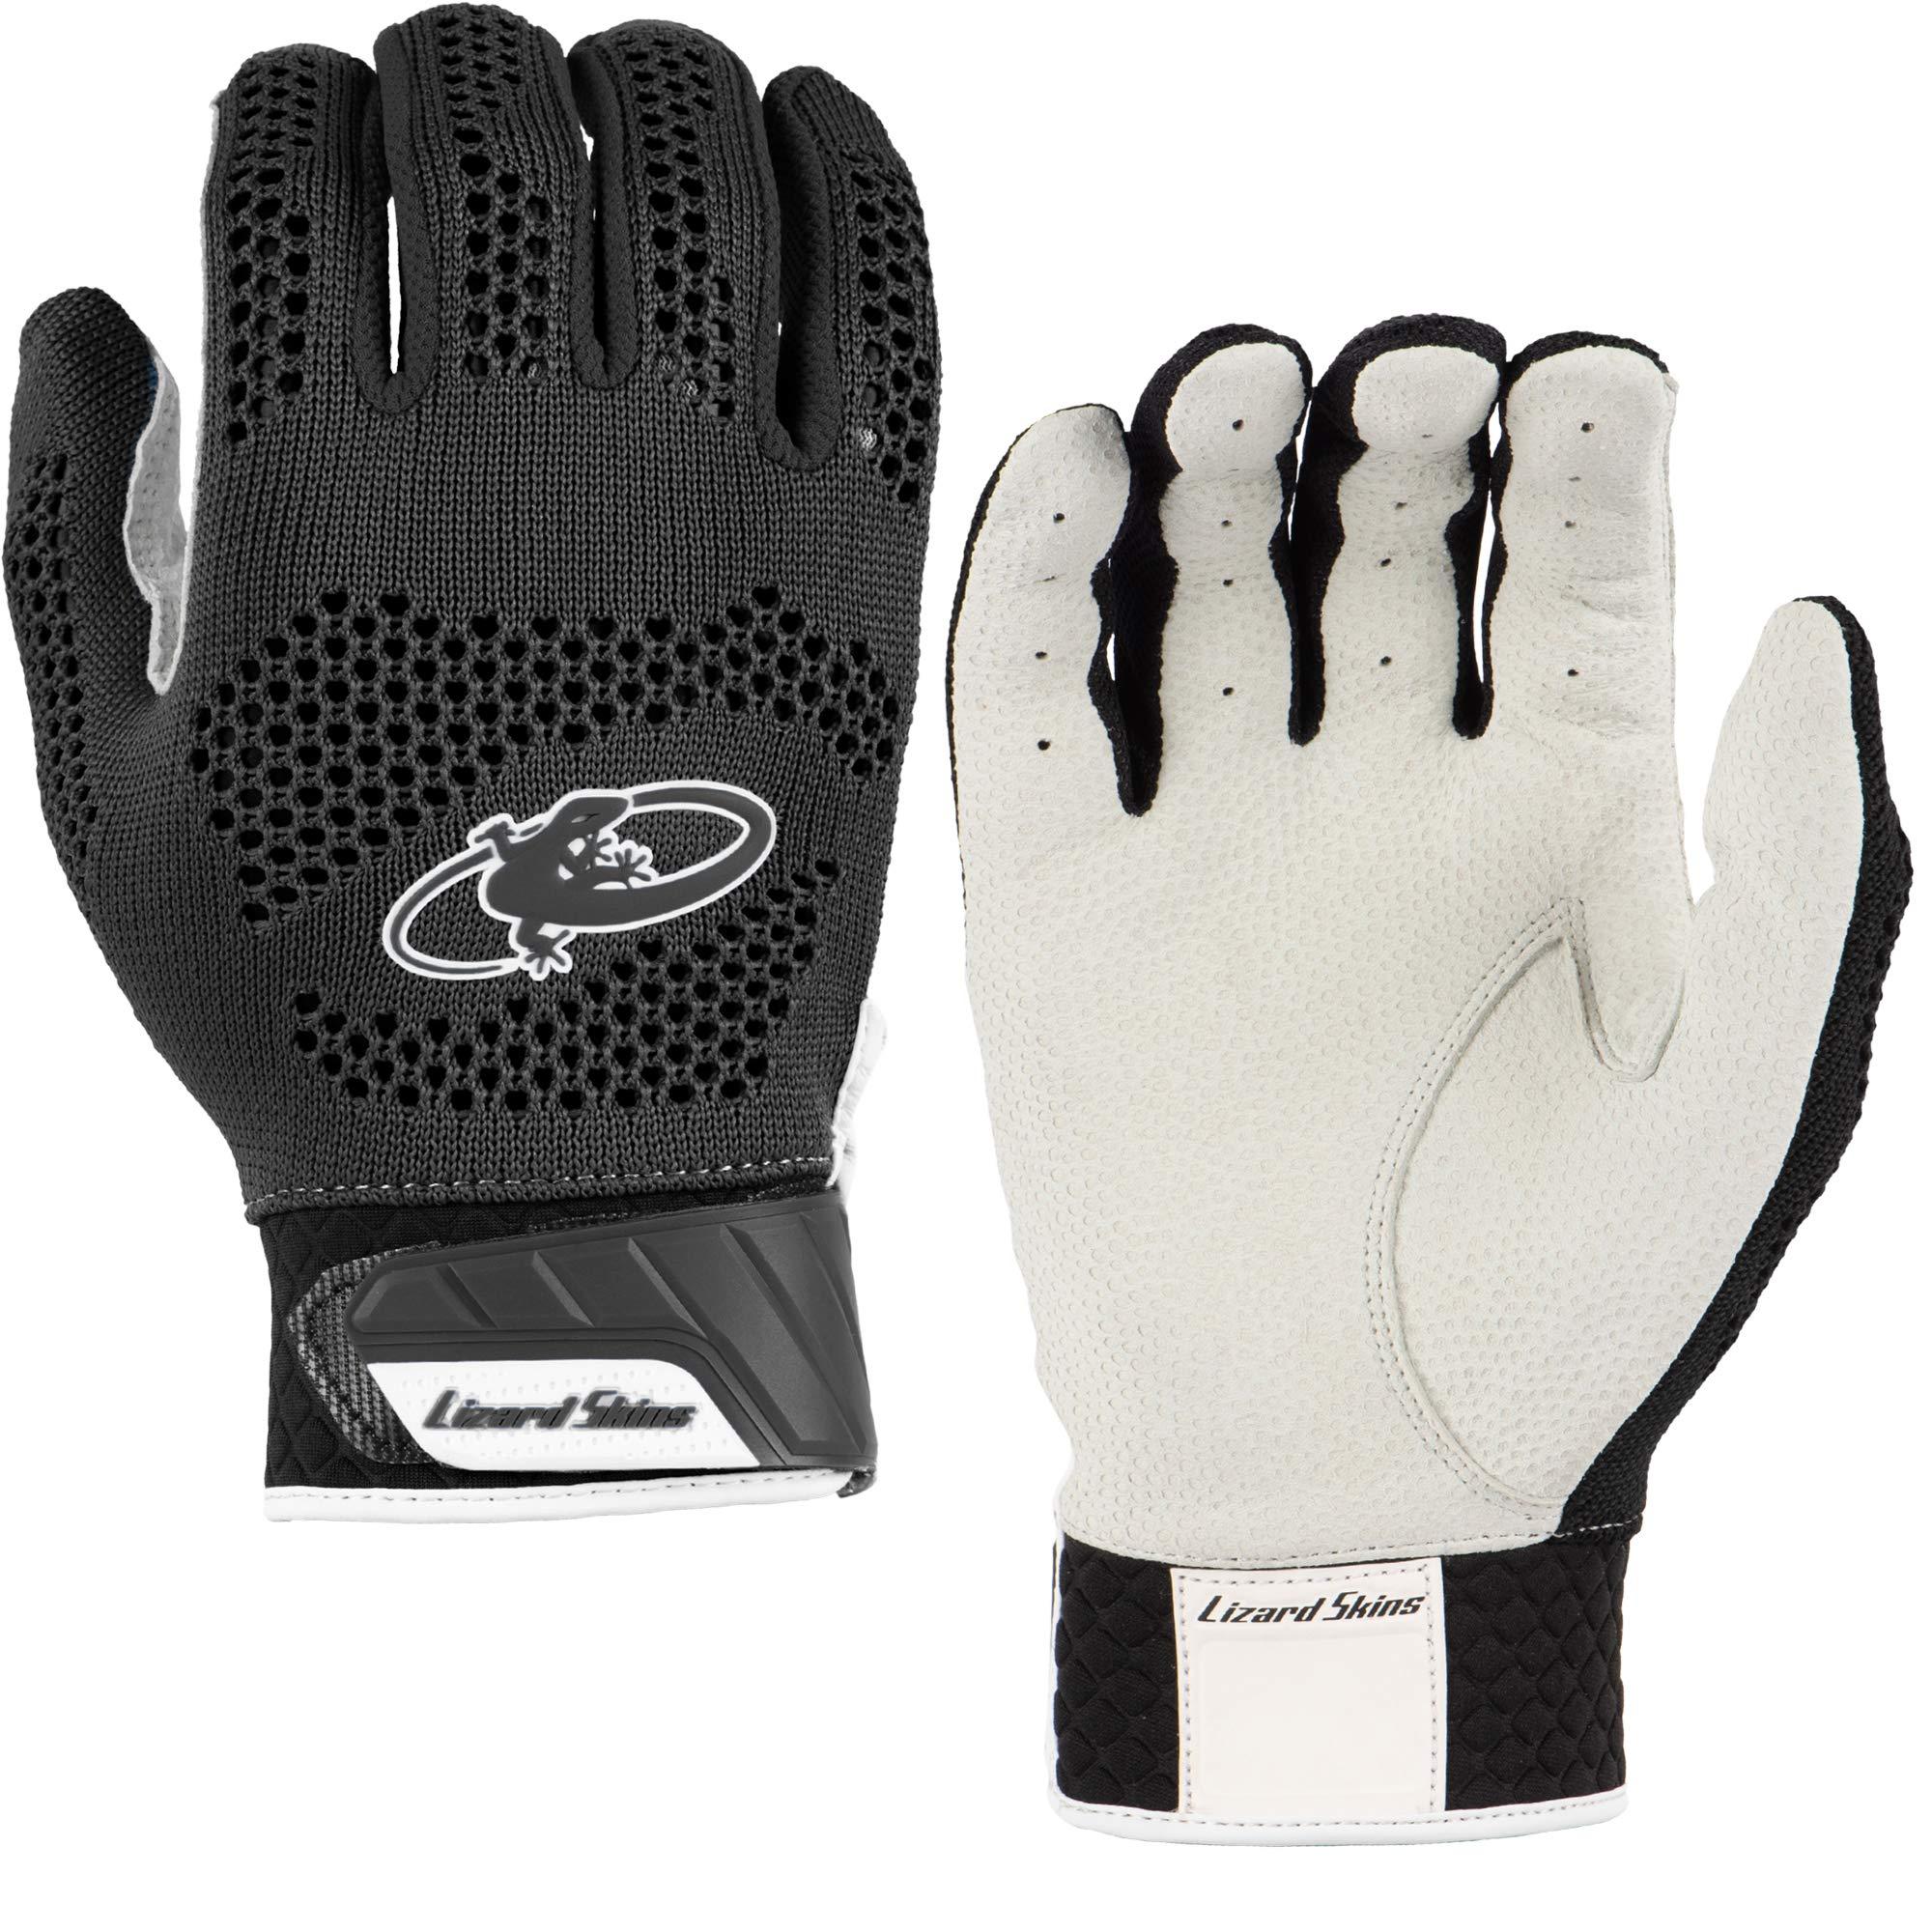 Lizard Skins Pro Knit 2.0 Baseball Batting Gloves - Adult Baseball Batting Gloves (Black, X-Small)